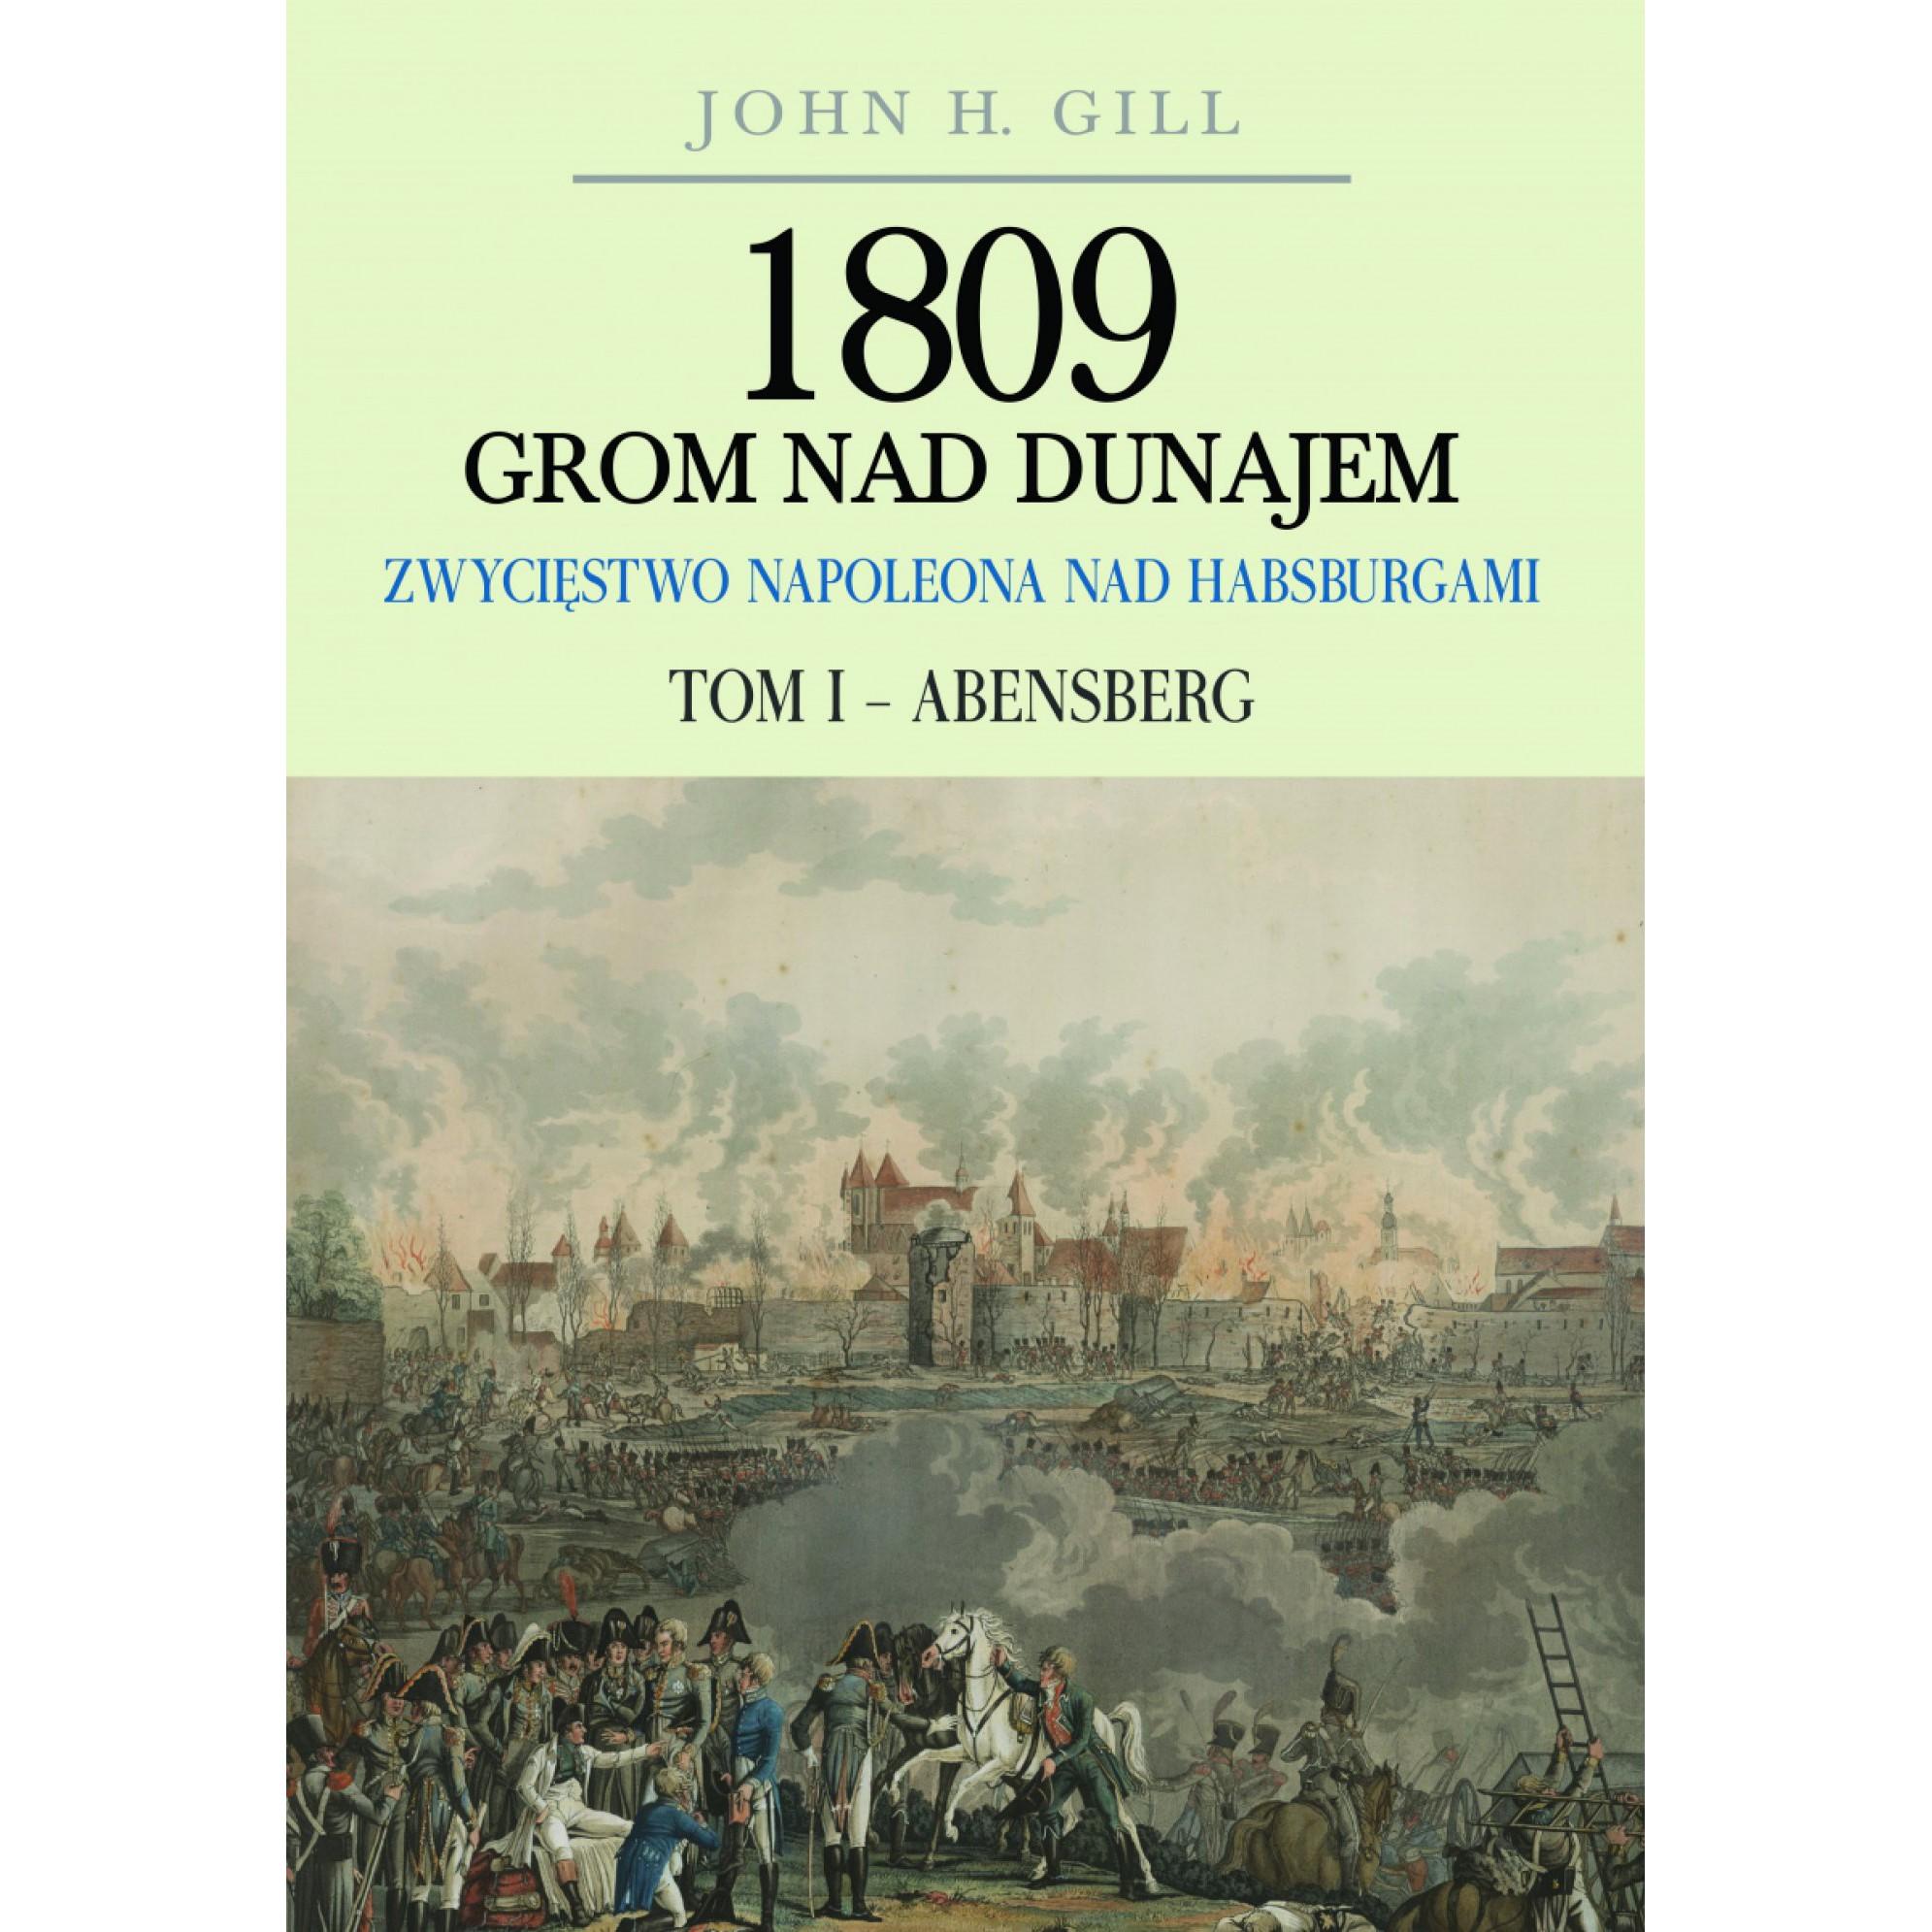 1809 Grom nad Dunajem. Zwycięstwa Napoleona nad Habsburgami. Tom I Abensberg - Outlet